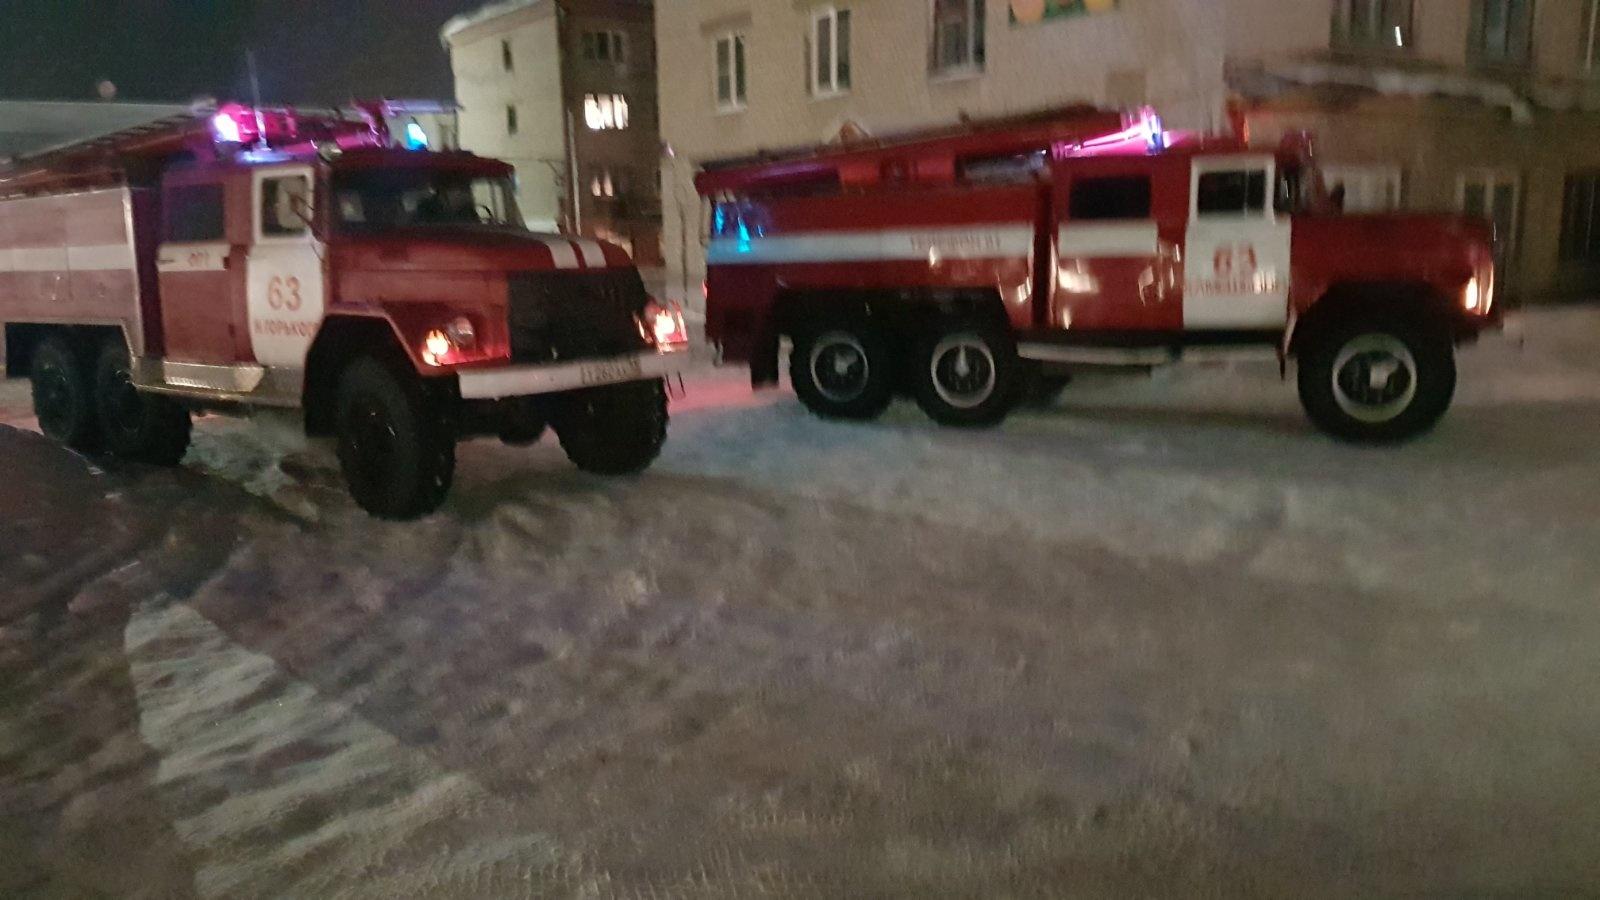 Пожар г.Камешково, ул. Ленина. д. 8, кв. 83